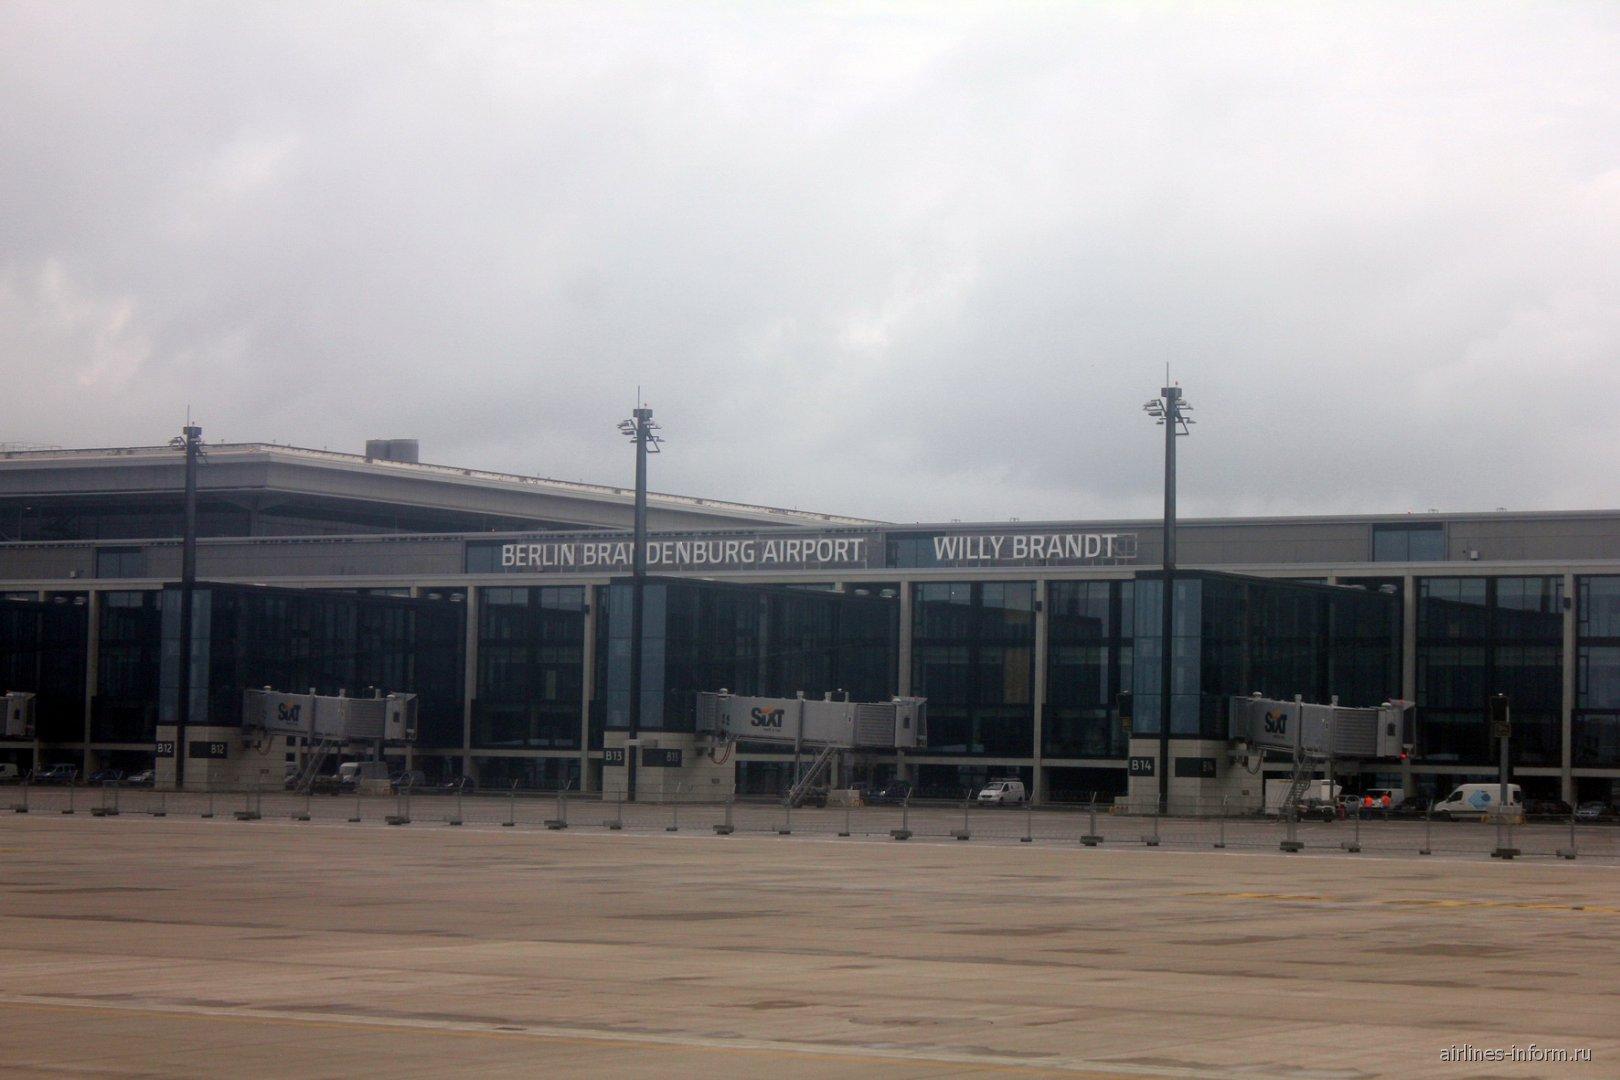 Пассажирский терминал аэропорта Берлин Бранденбург